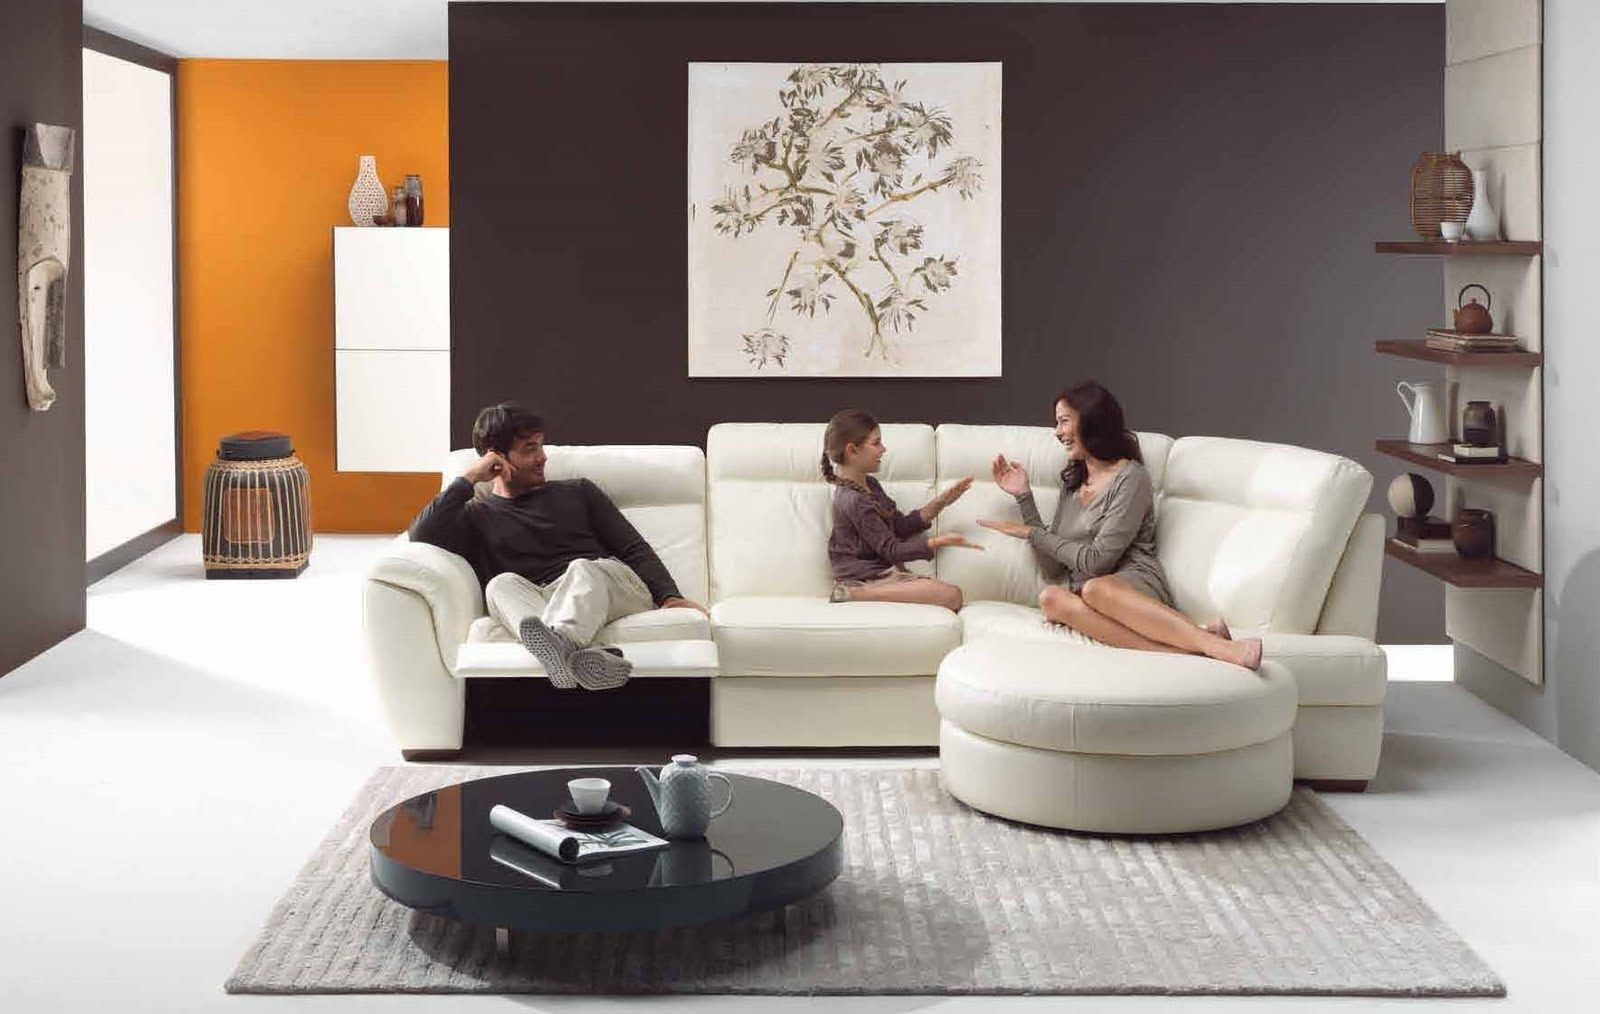 living room design styles. Modern Korean Style Living Room Interior Design  condo interior design inspirations Pinterest room and